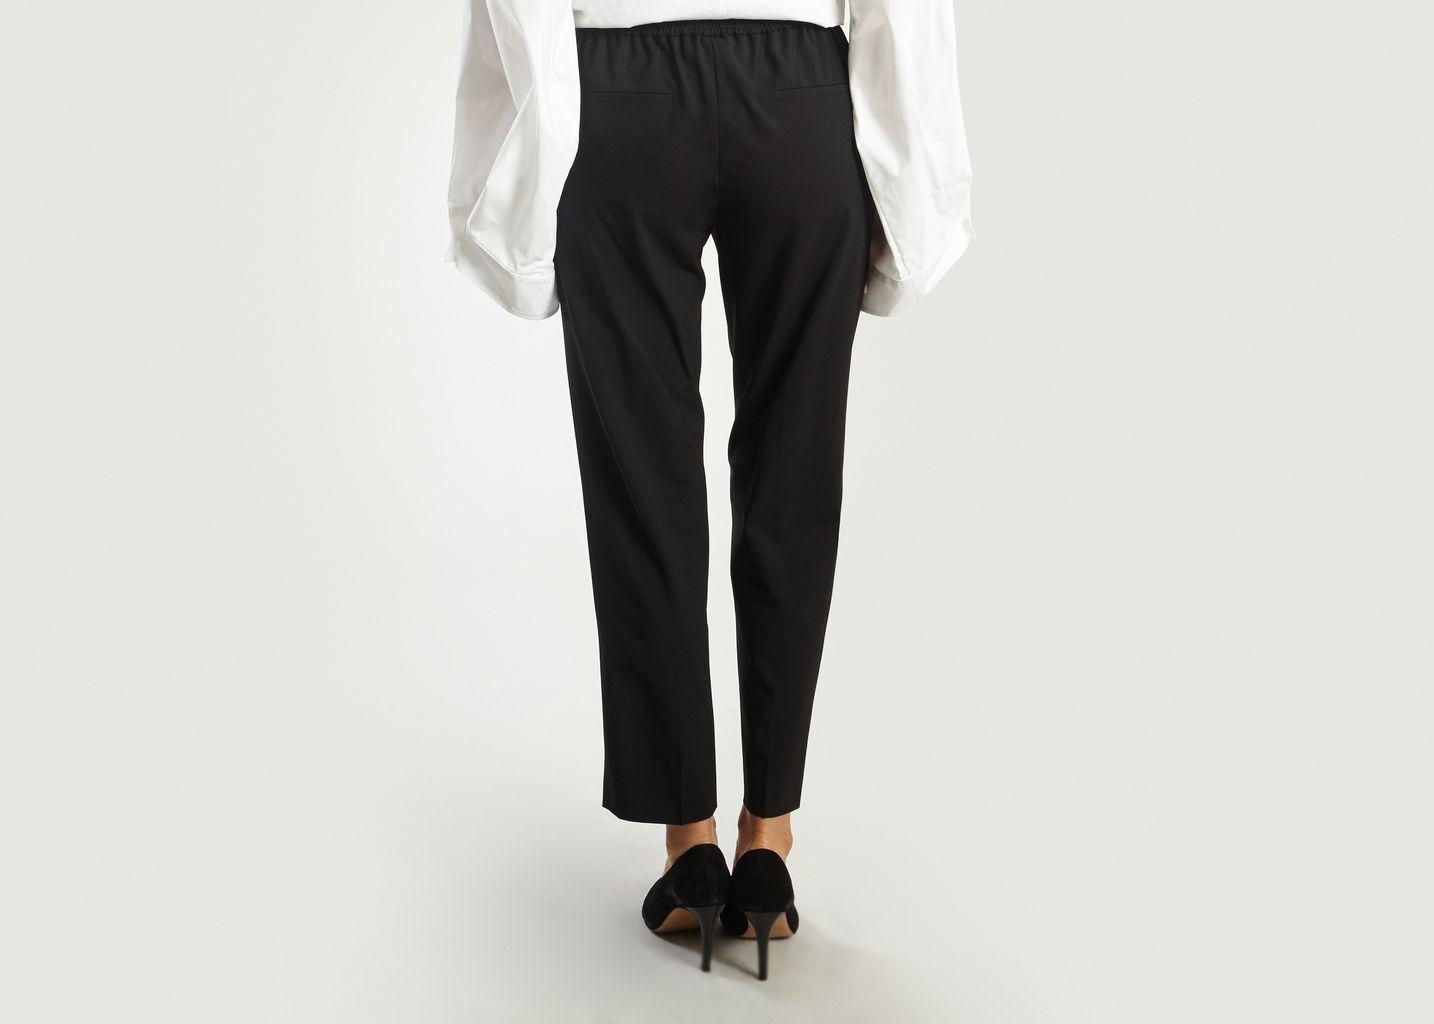 Pantalon Pull On - Theory